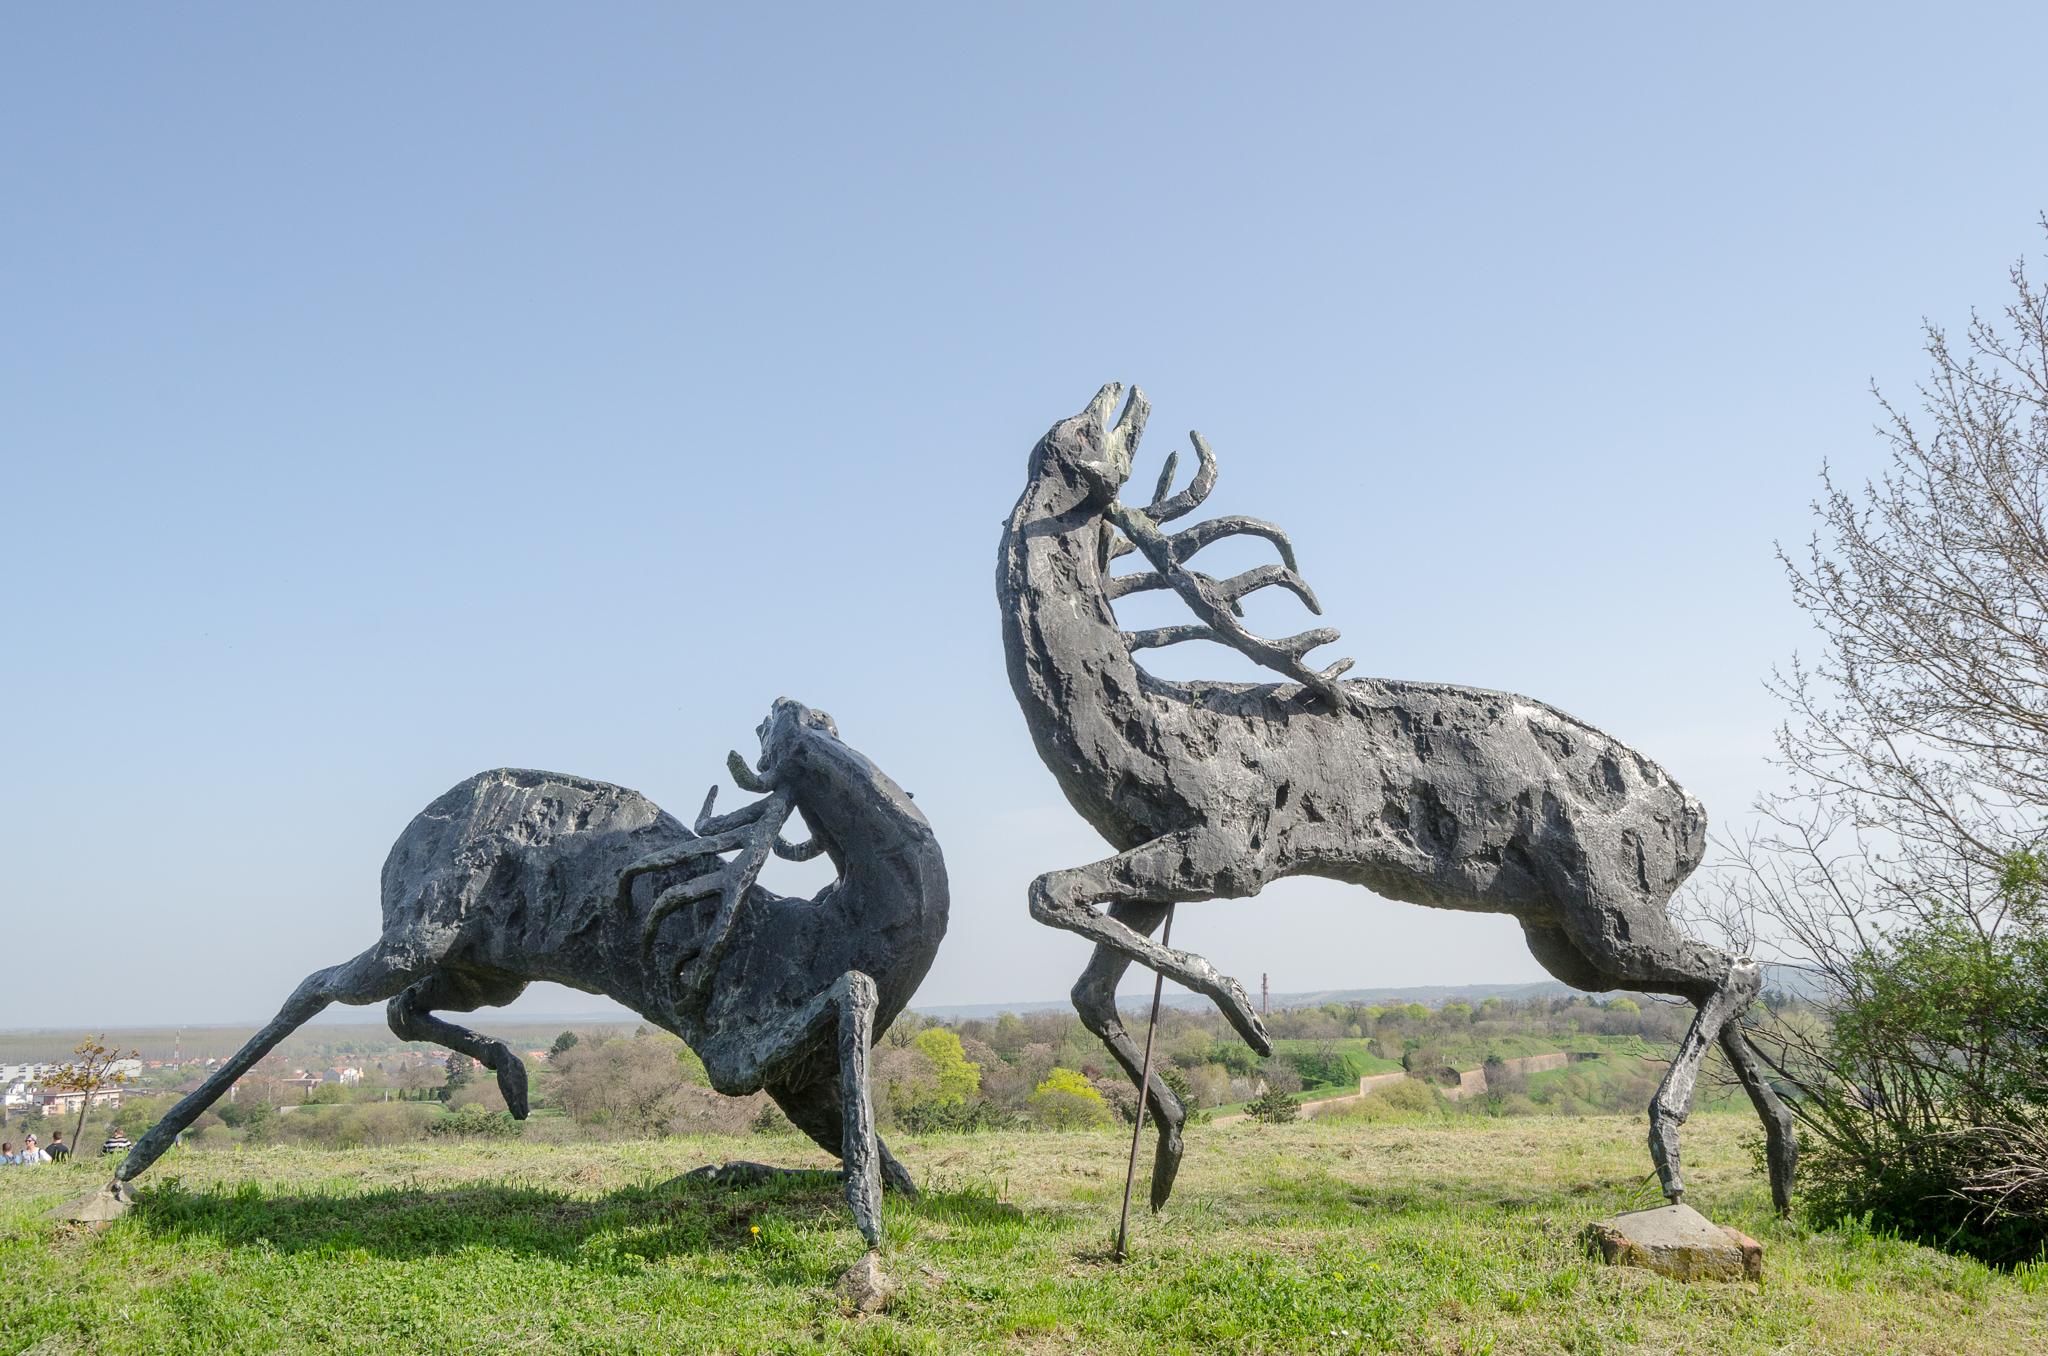 Vajarstvo-skulpture - Page 20 Skulptura-%E2%80%9EBorba-jelena%E2%80%9C